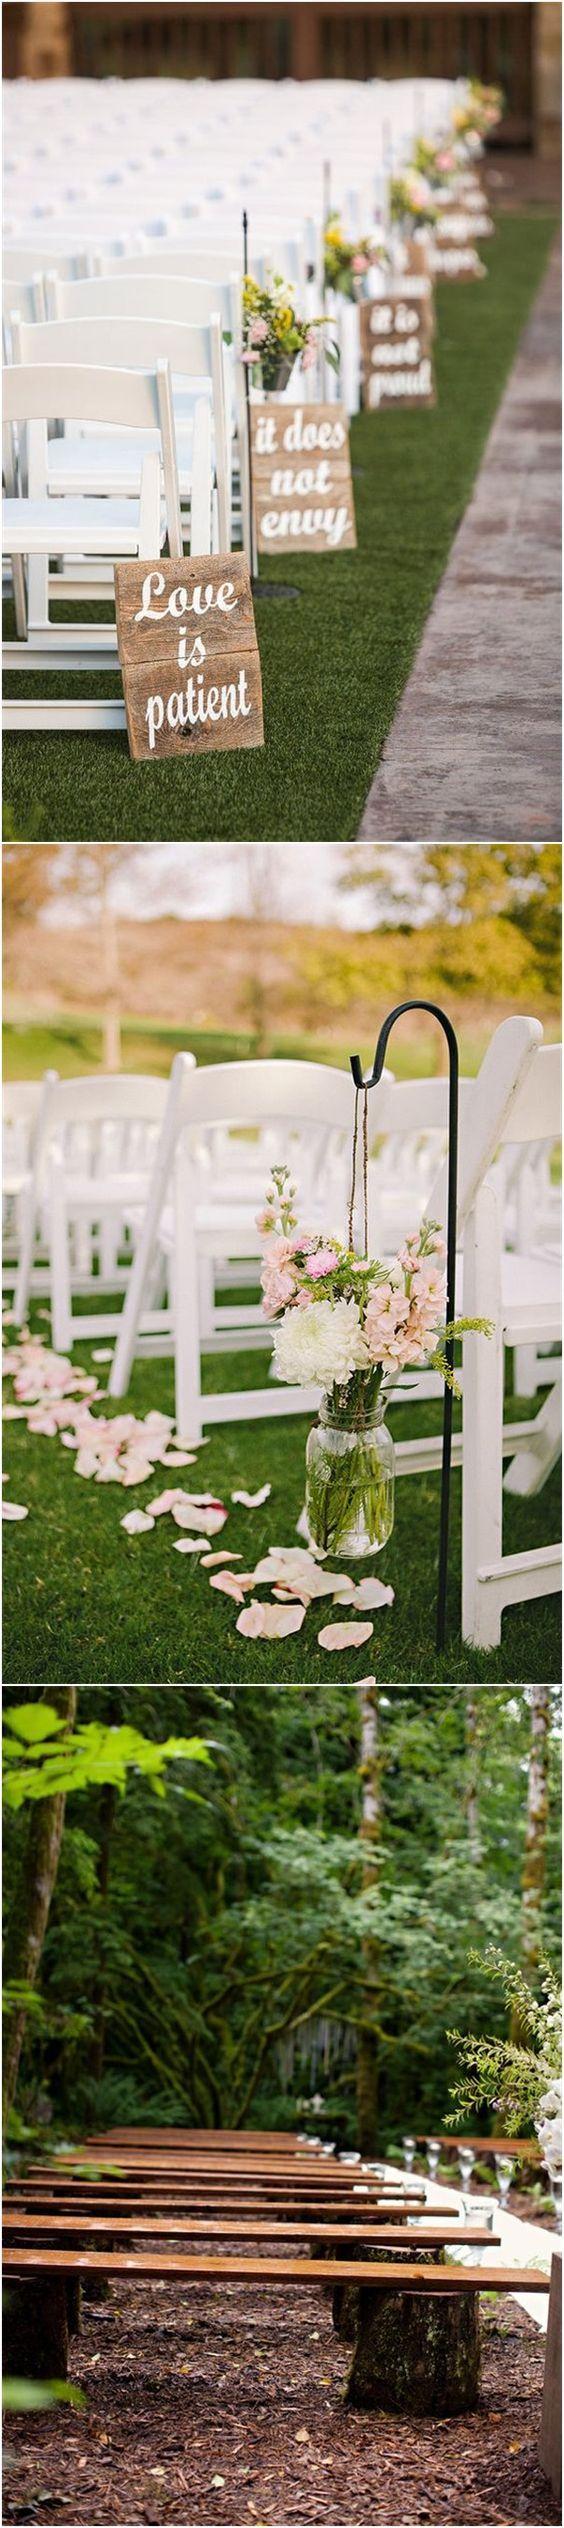 25 rustic outdoor wedding ceremony decorations ideas wedding ideas country weddings 25 rustic outdoor wedding ceremony decorations ideas junglespirit Gallery